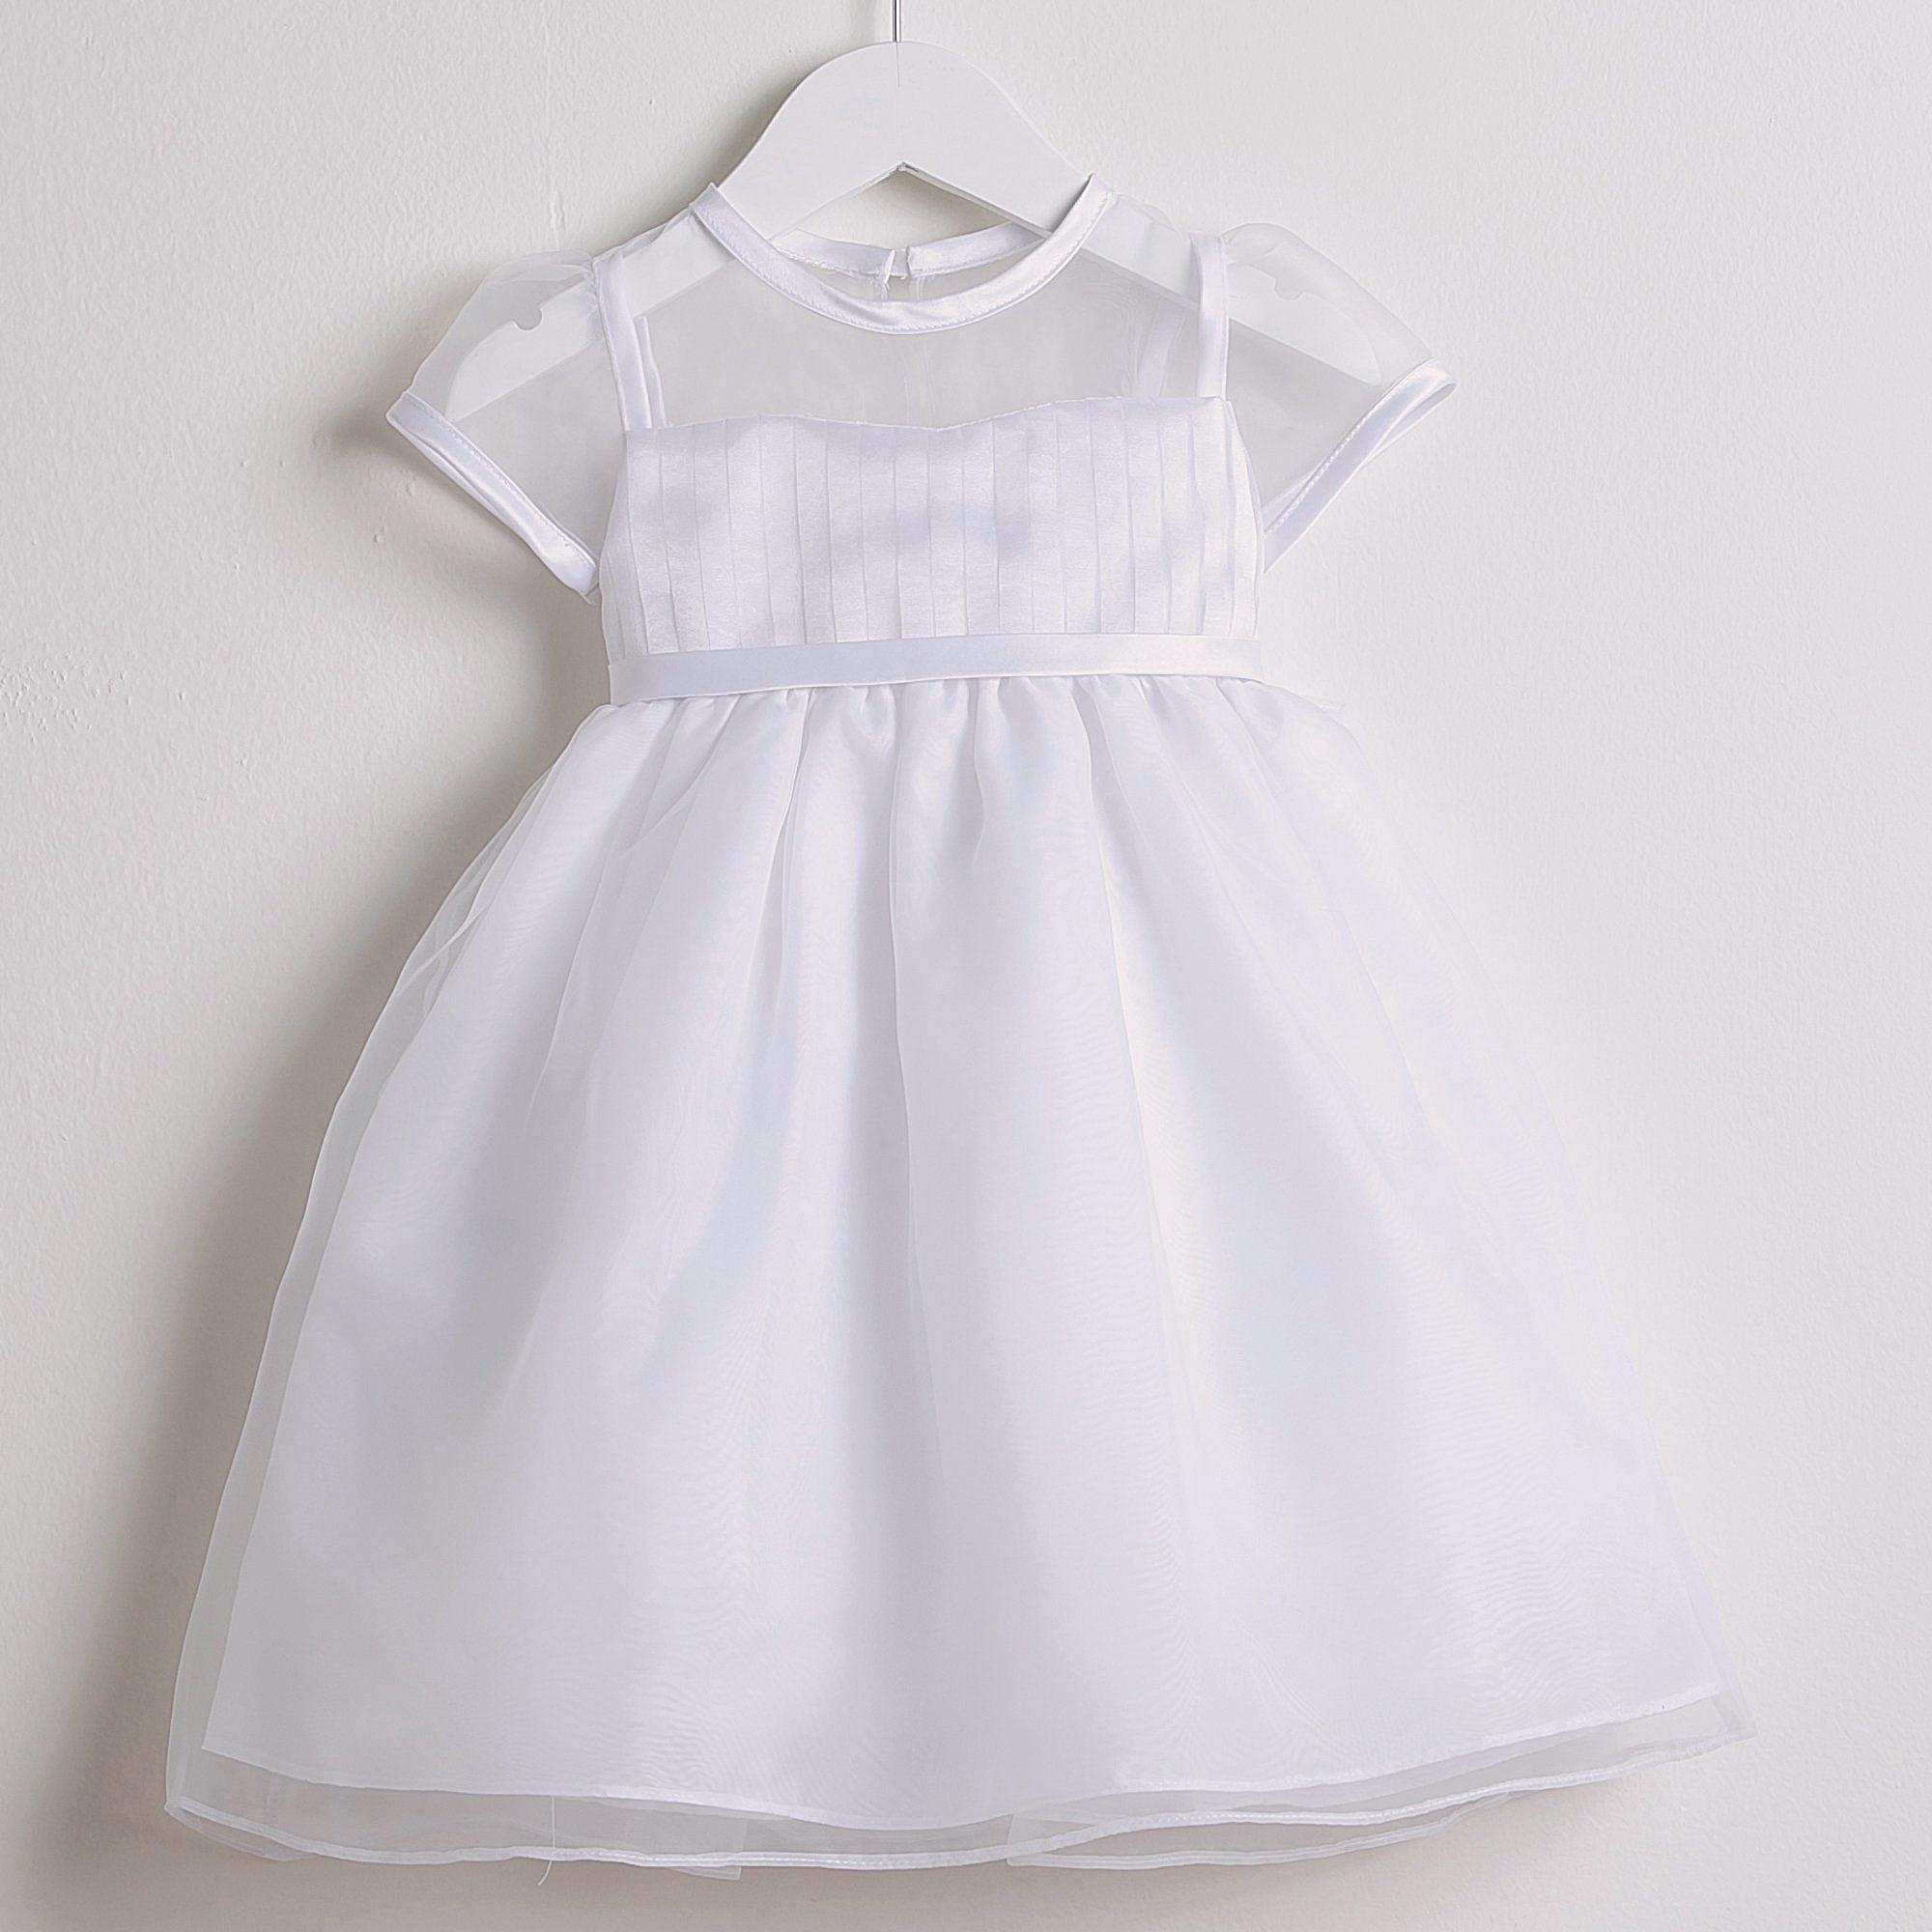 Toddler boutique dresses